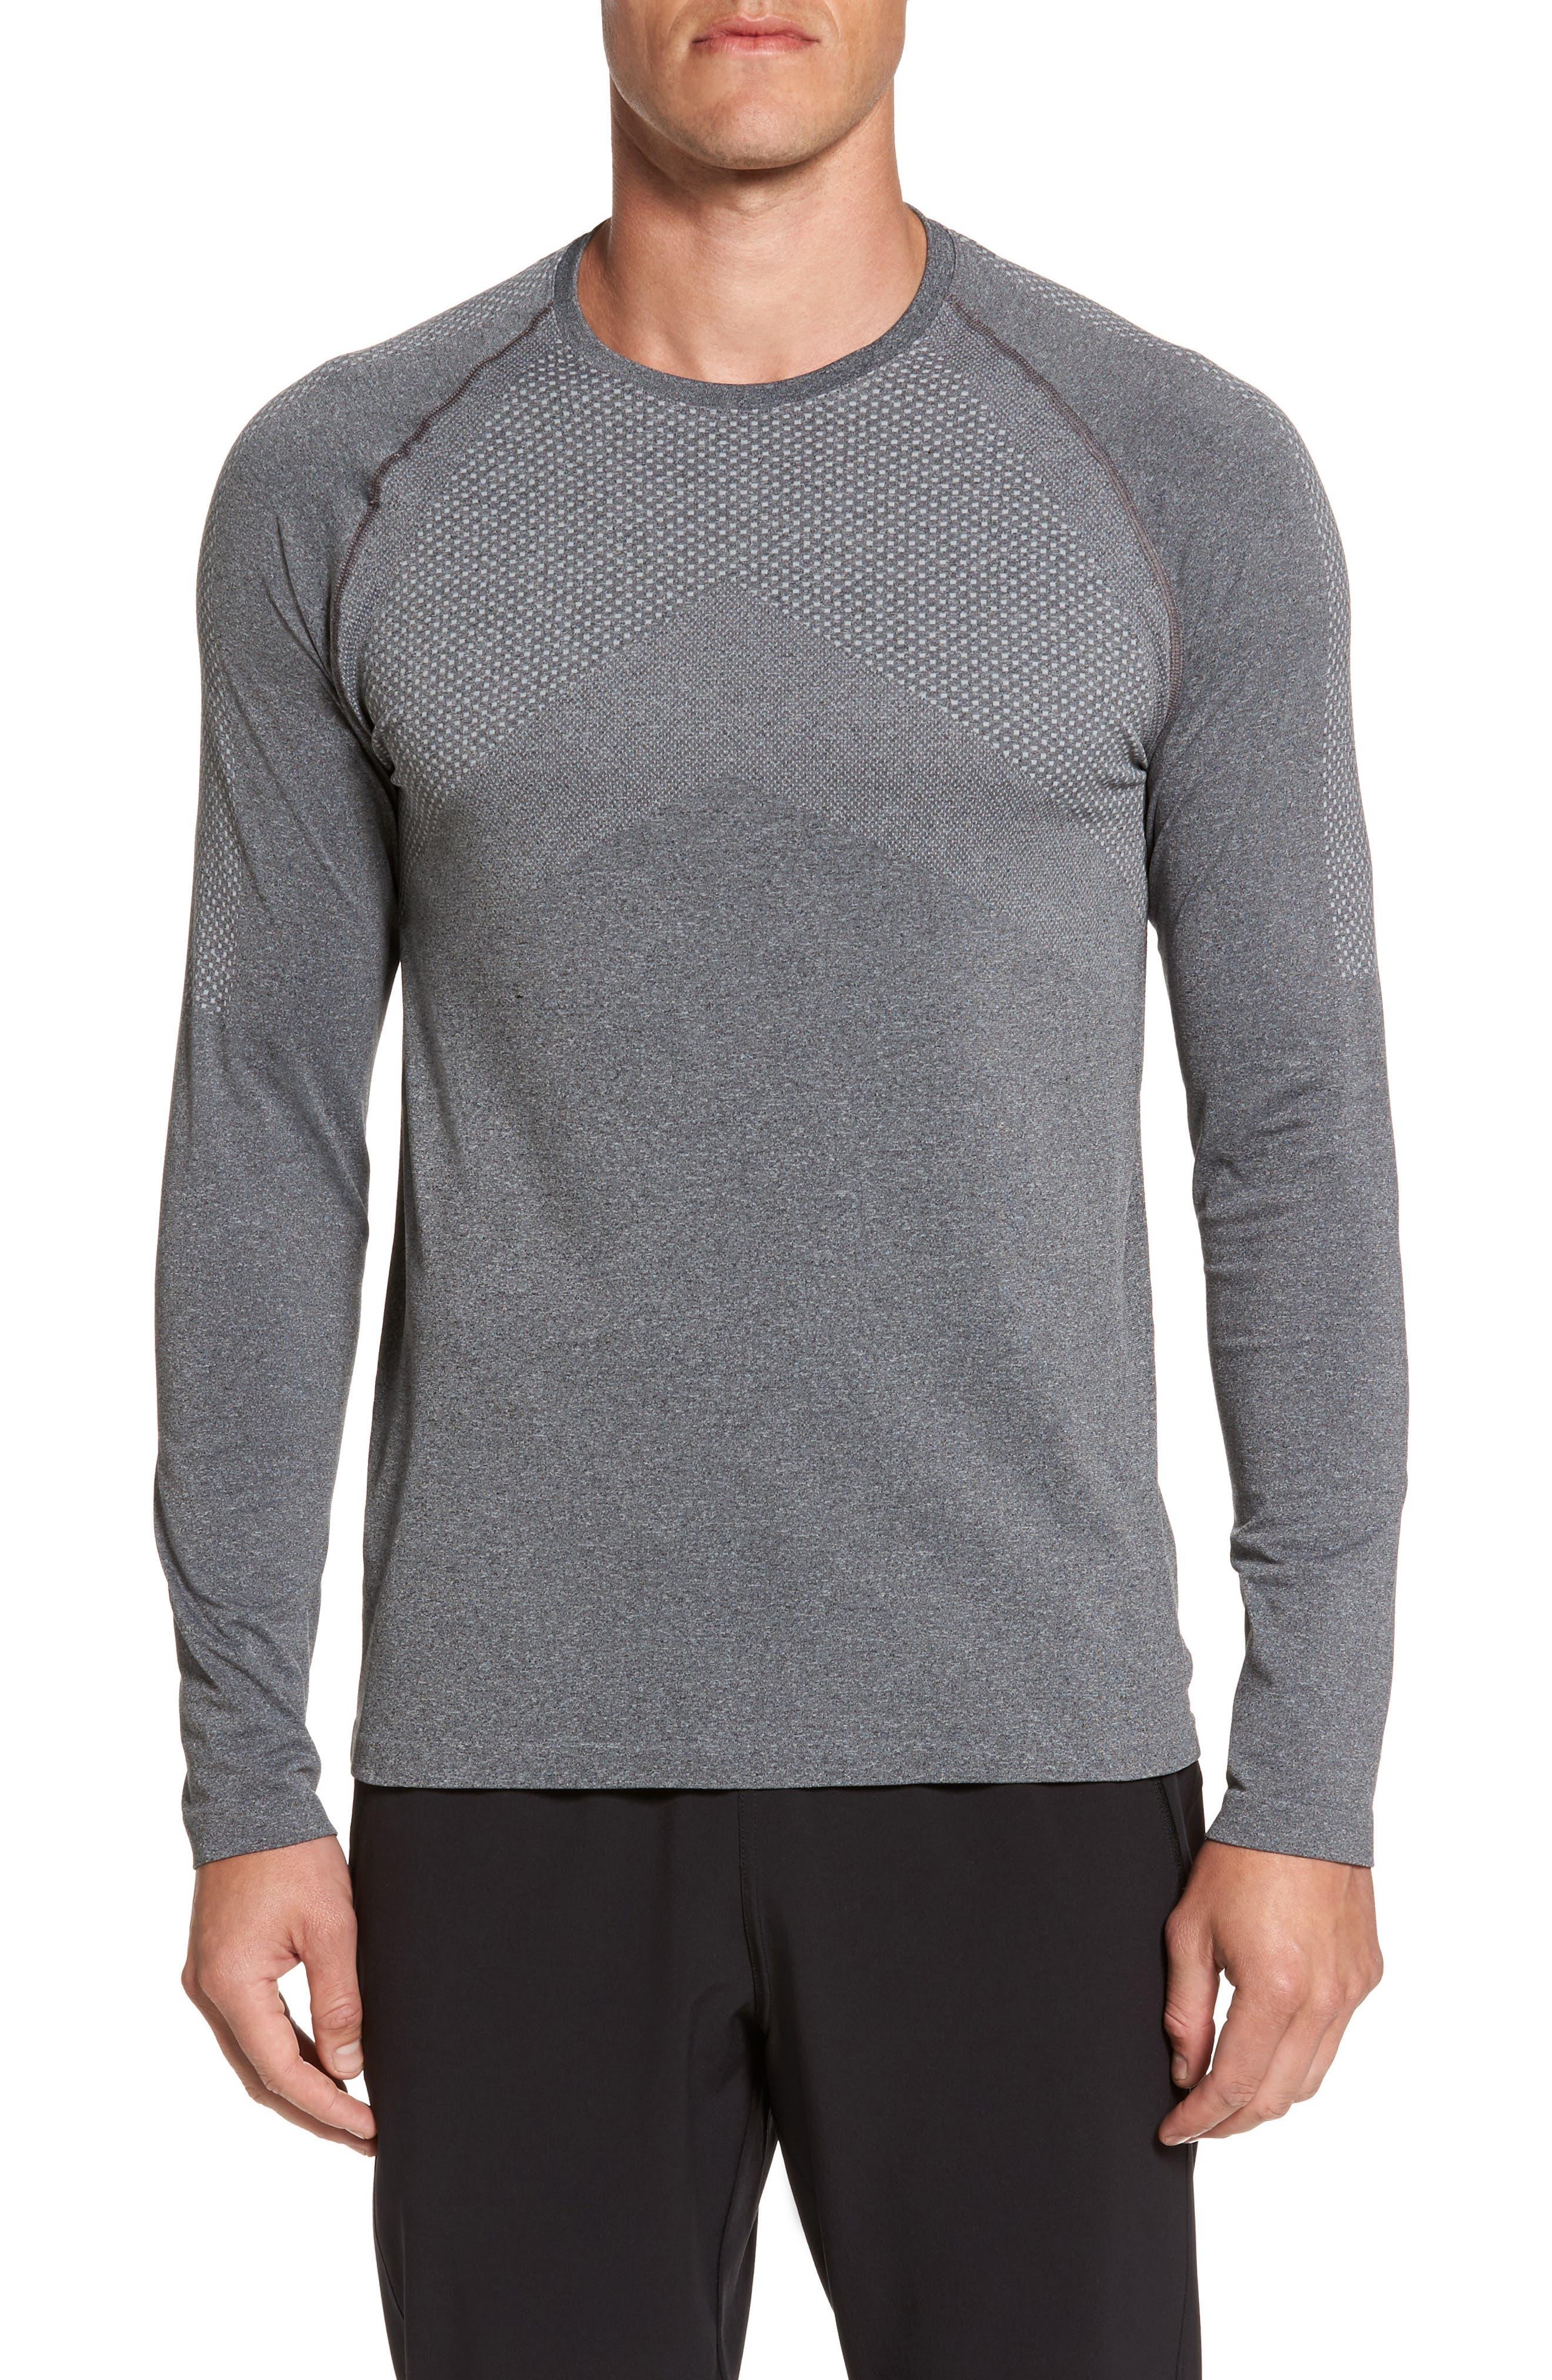 Zella Zeolite Long Sleeve Performance T-Shirt